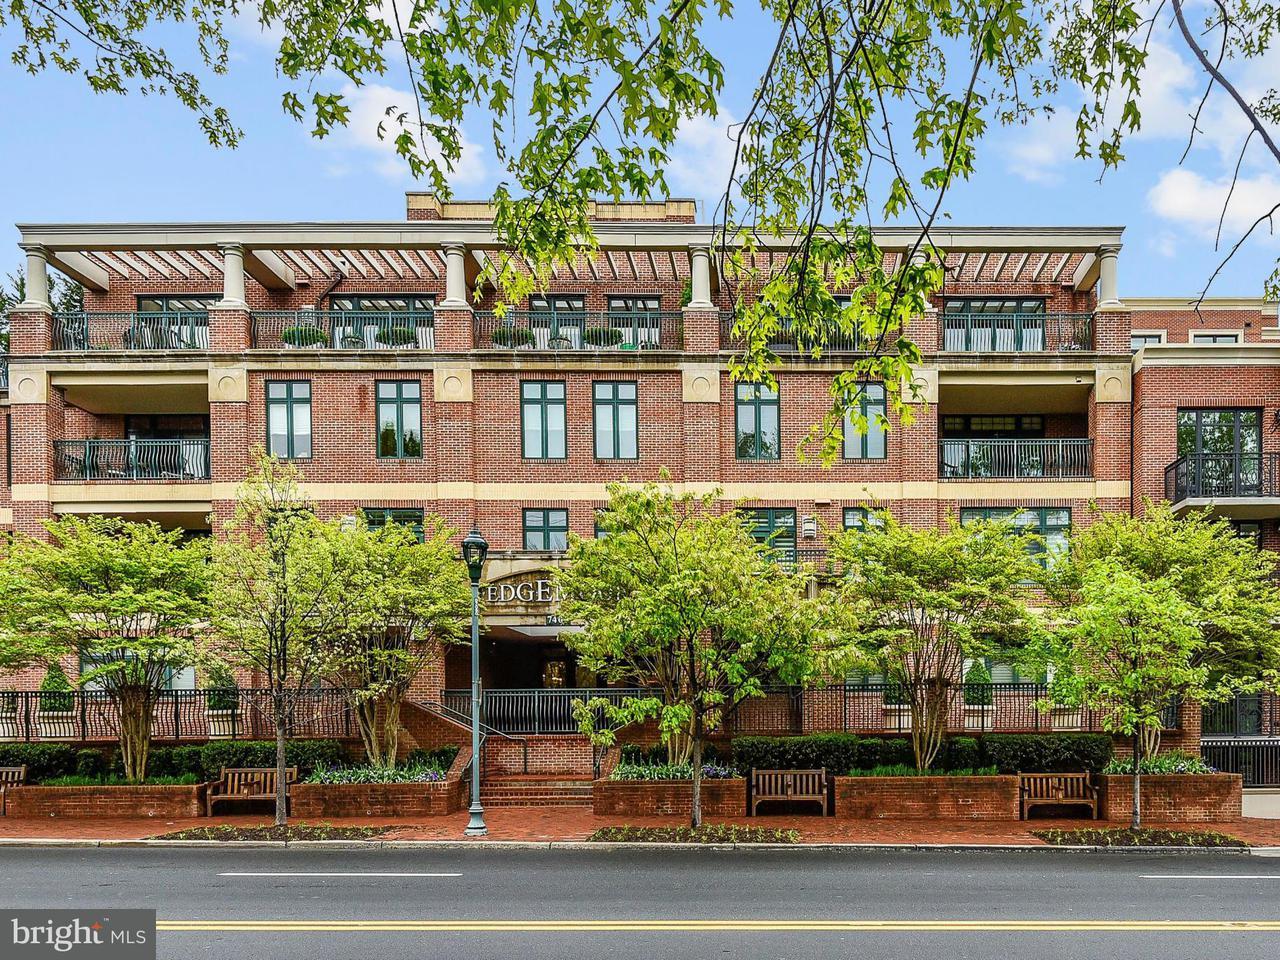 Townhouse for Sale at 7405 ARLINGTON RD #401 7405 ARLINGTON RD #401 Bethesda, Maryland 20814 United States